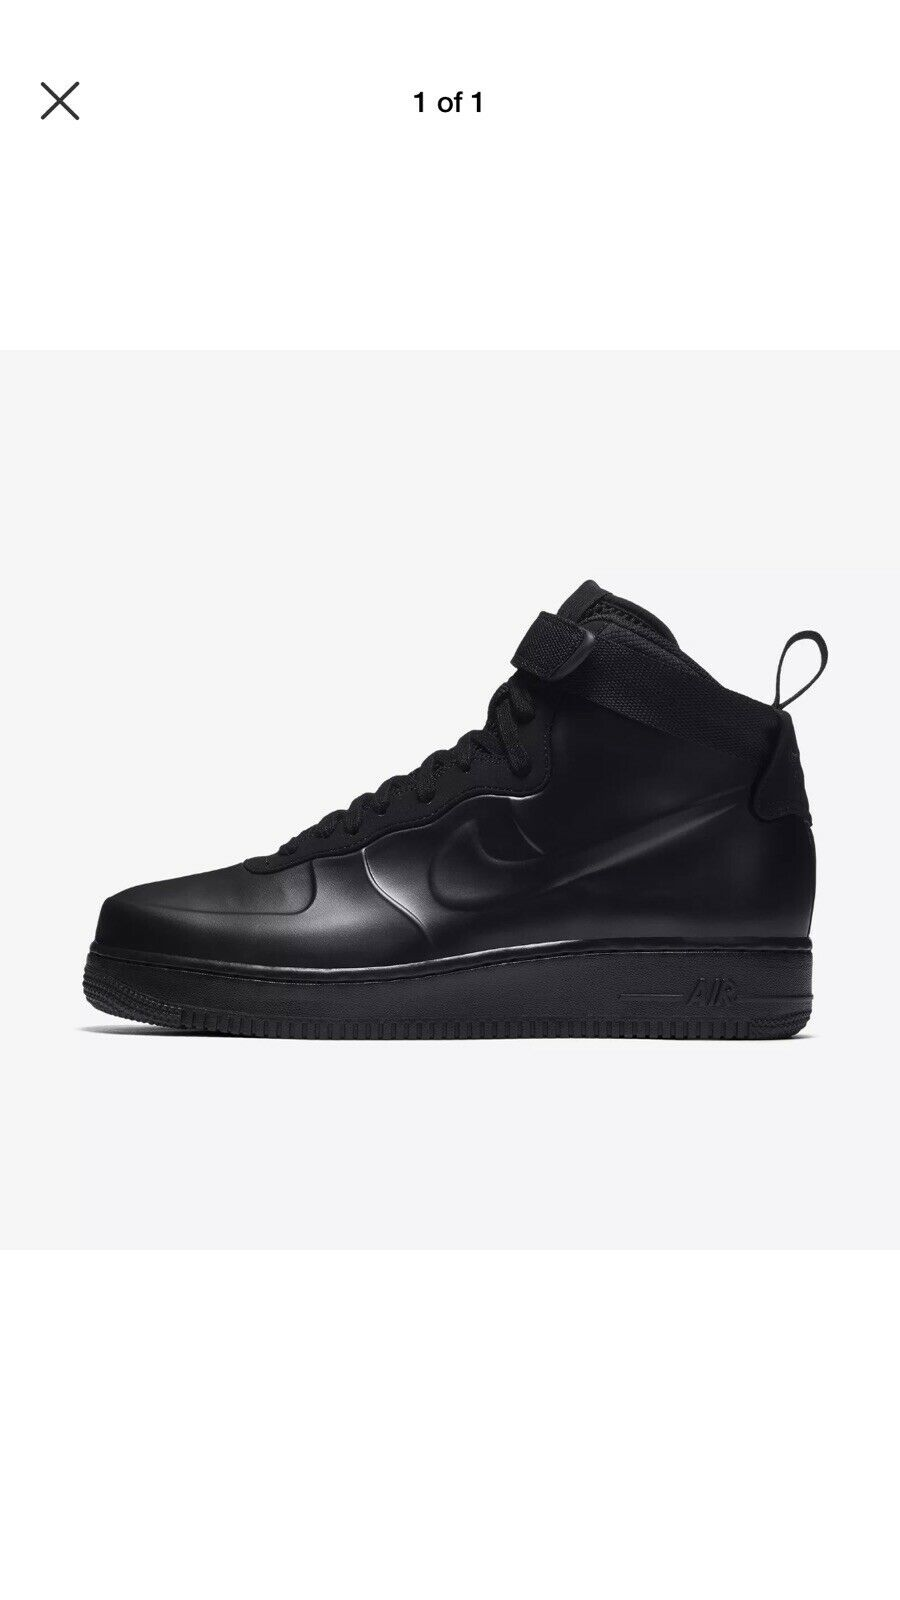 Mens Nike Air Force 1 Foamposite Cupsole Triple Black AH6771-001 Sz 11.5